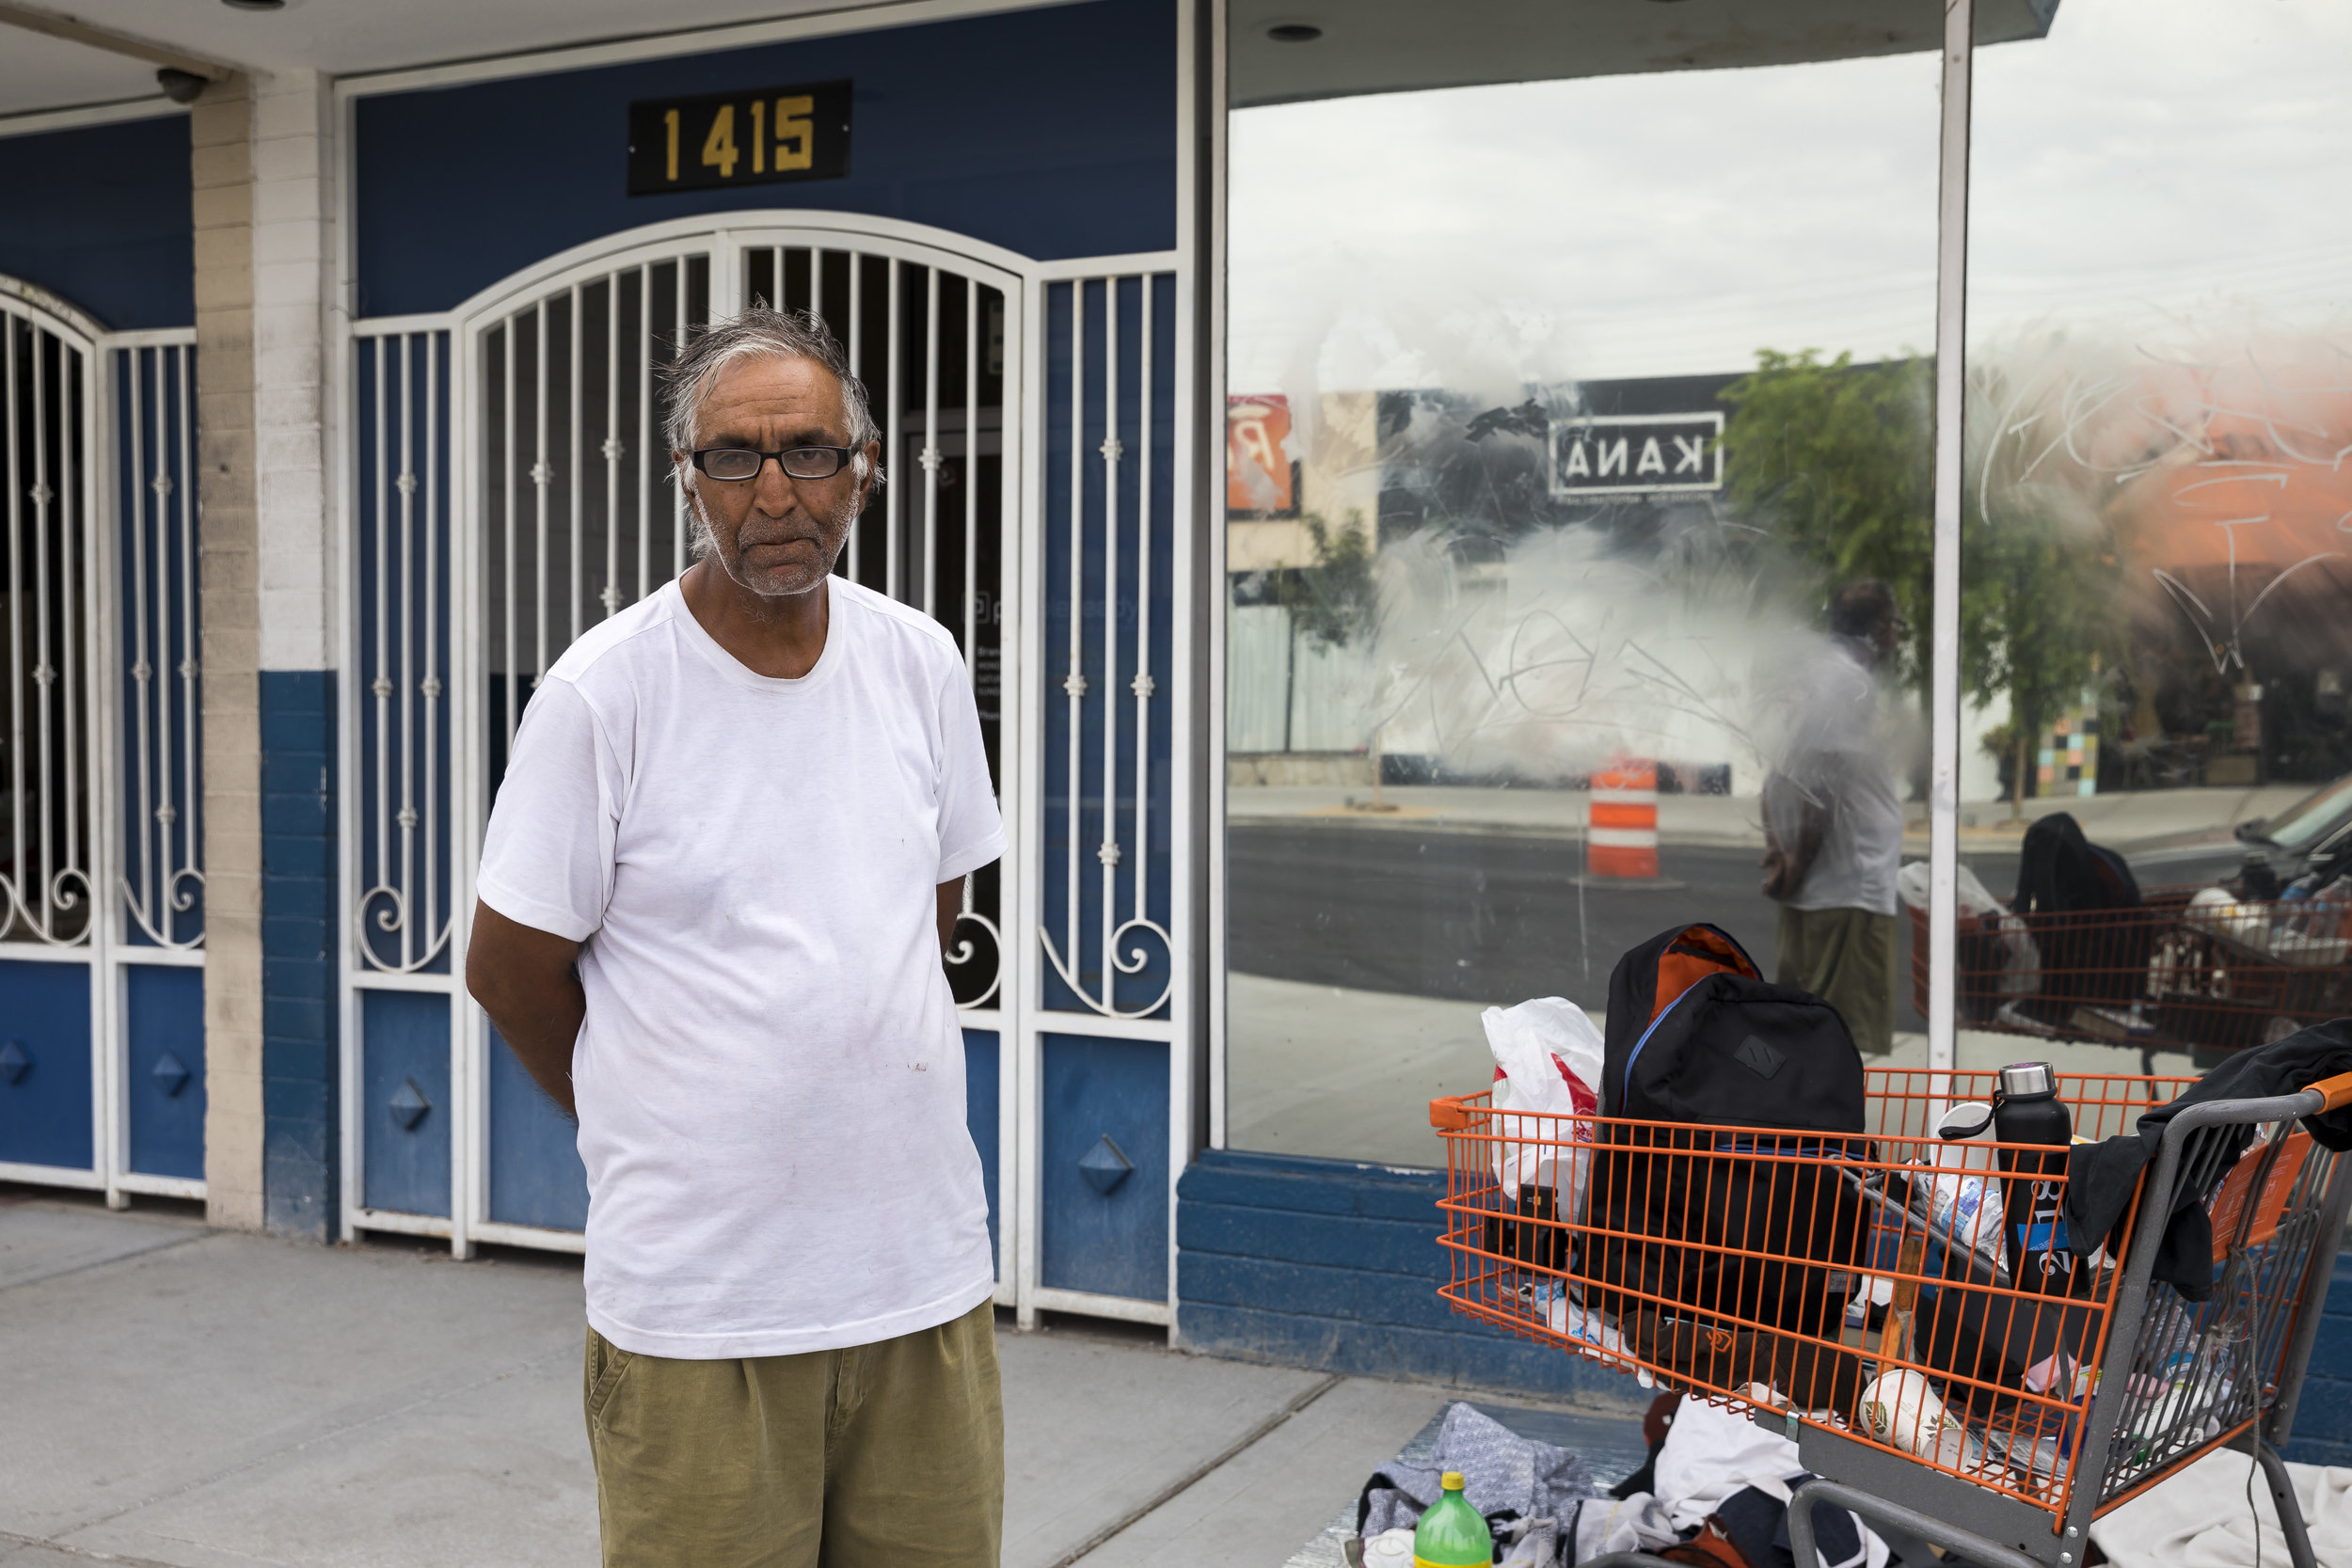 Monir Rafiq, former Defense Intelligent Contractor in Afghanistan, seen on the streets of Las Vegas on July 9, 2018.